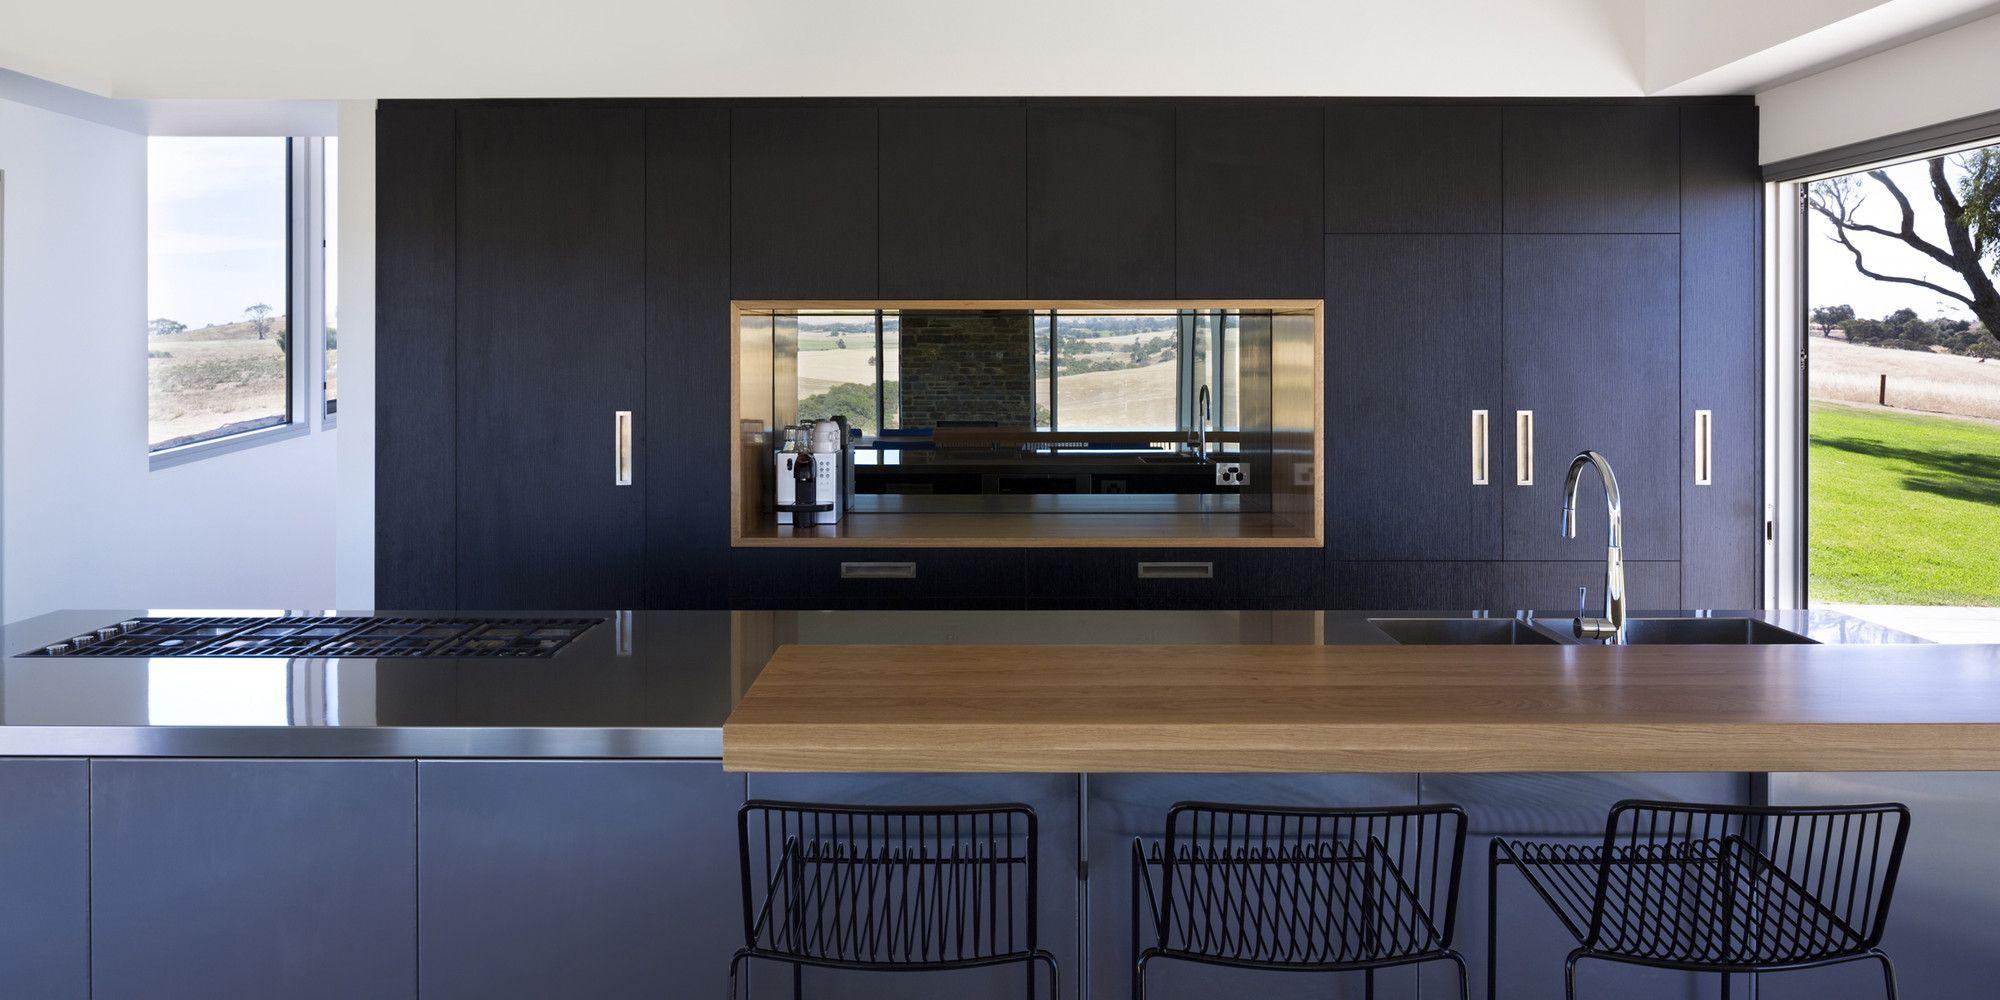 Kitchen Designer Salary Custom Pinlisa Booth On Kitchen & Bathroom  Pinterest  Kitchens Inspiration